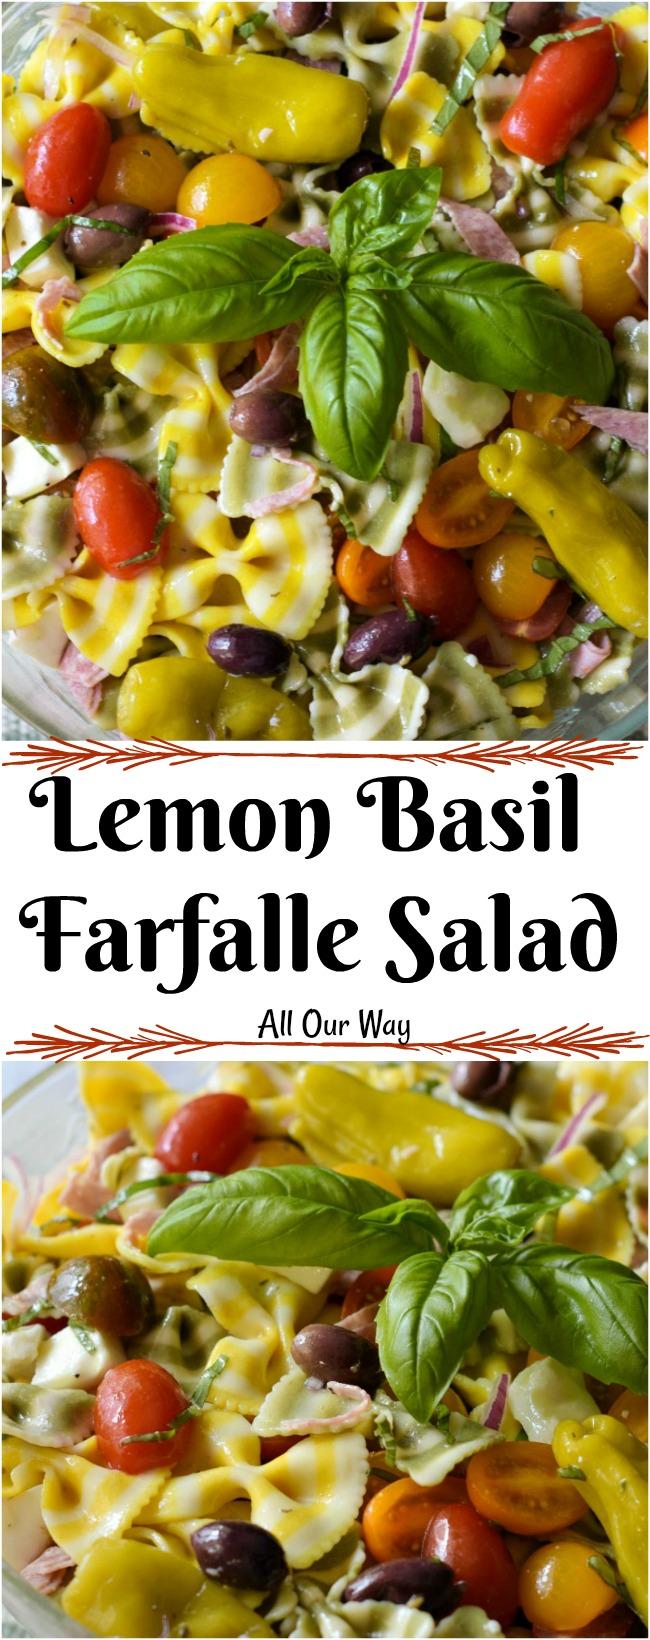 Lemon Basil Farfalle Salad an Italian pasta salad celebrating the tastes of summer.